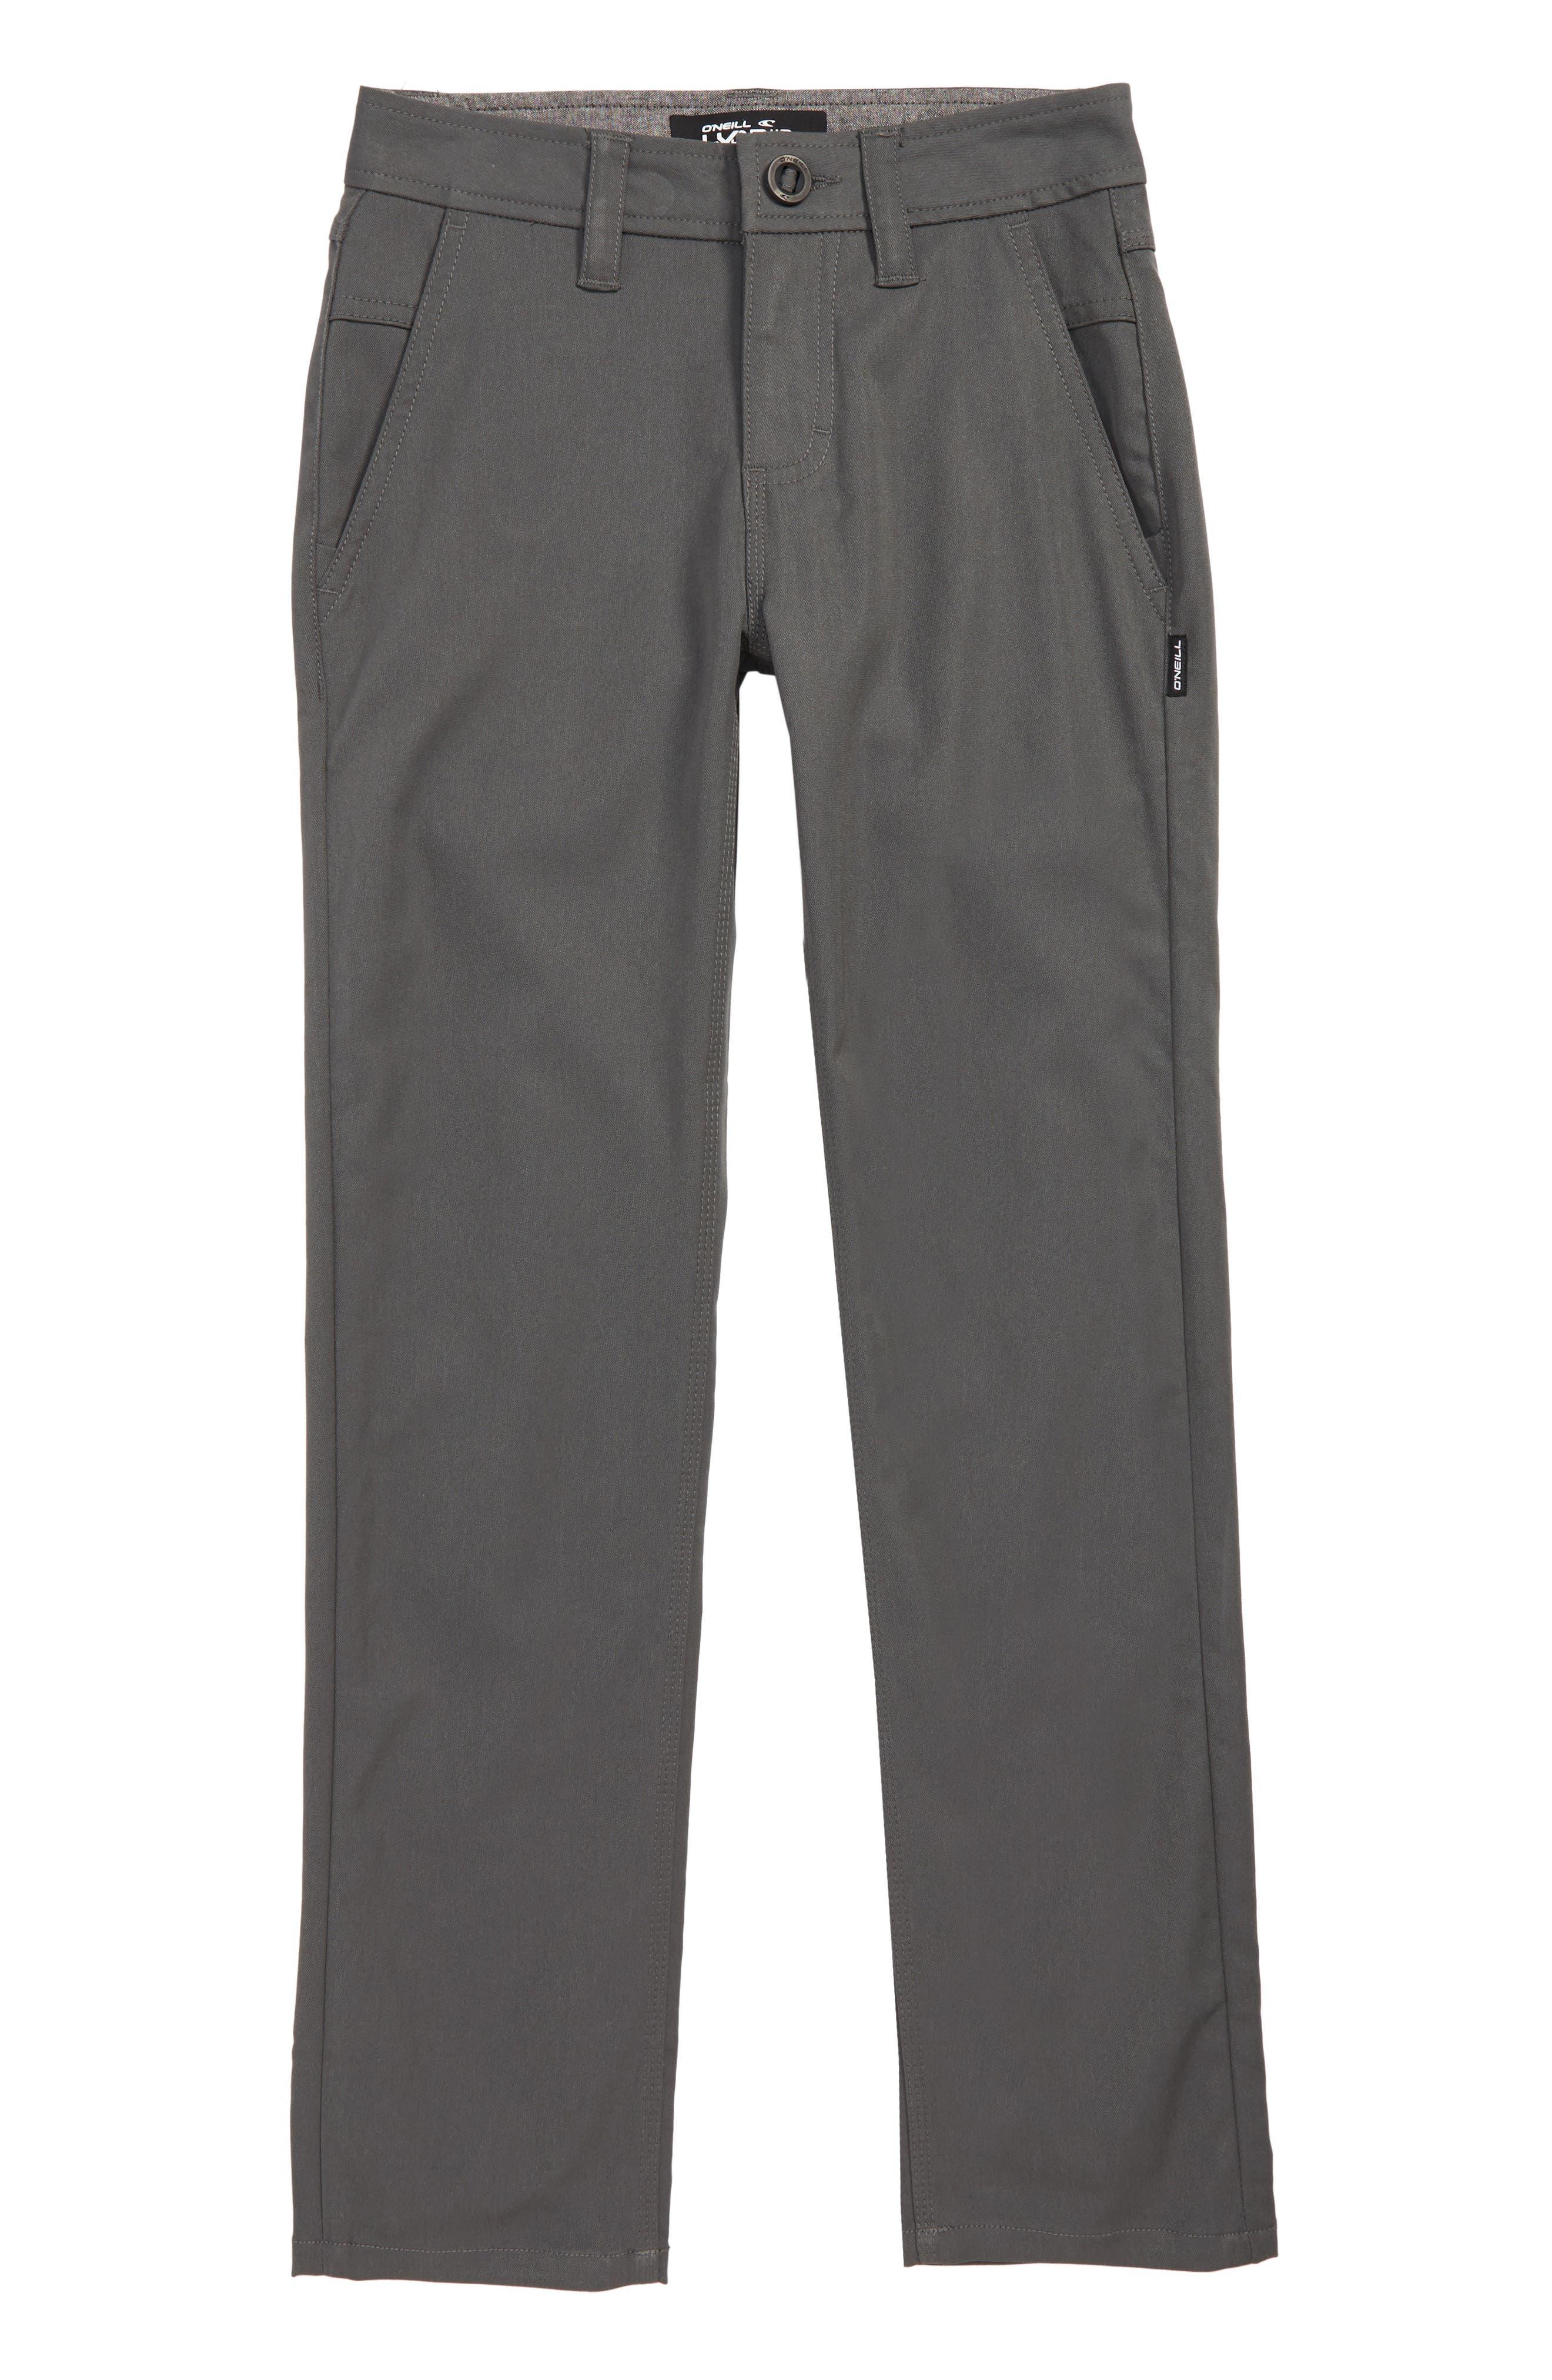 Redlands Hybrid Pants,                         Main,                         color, Dark Fatigue